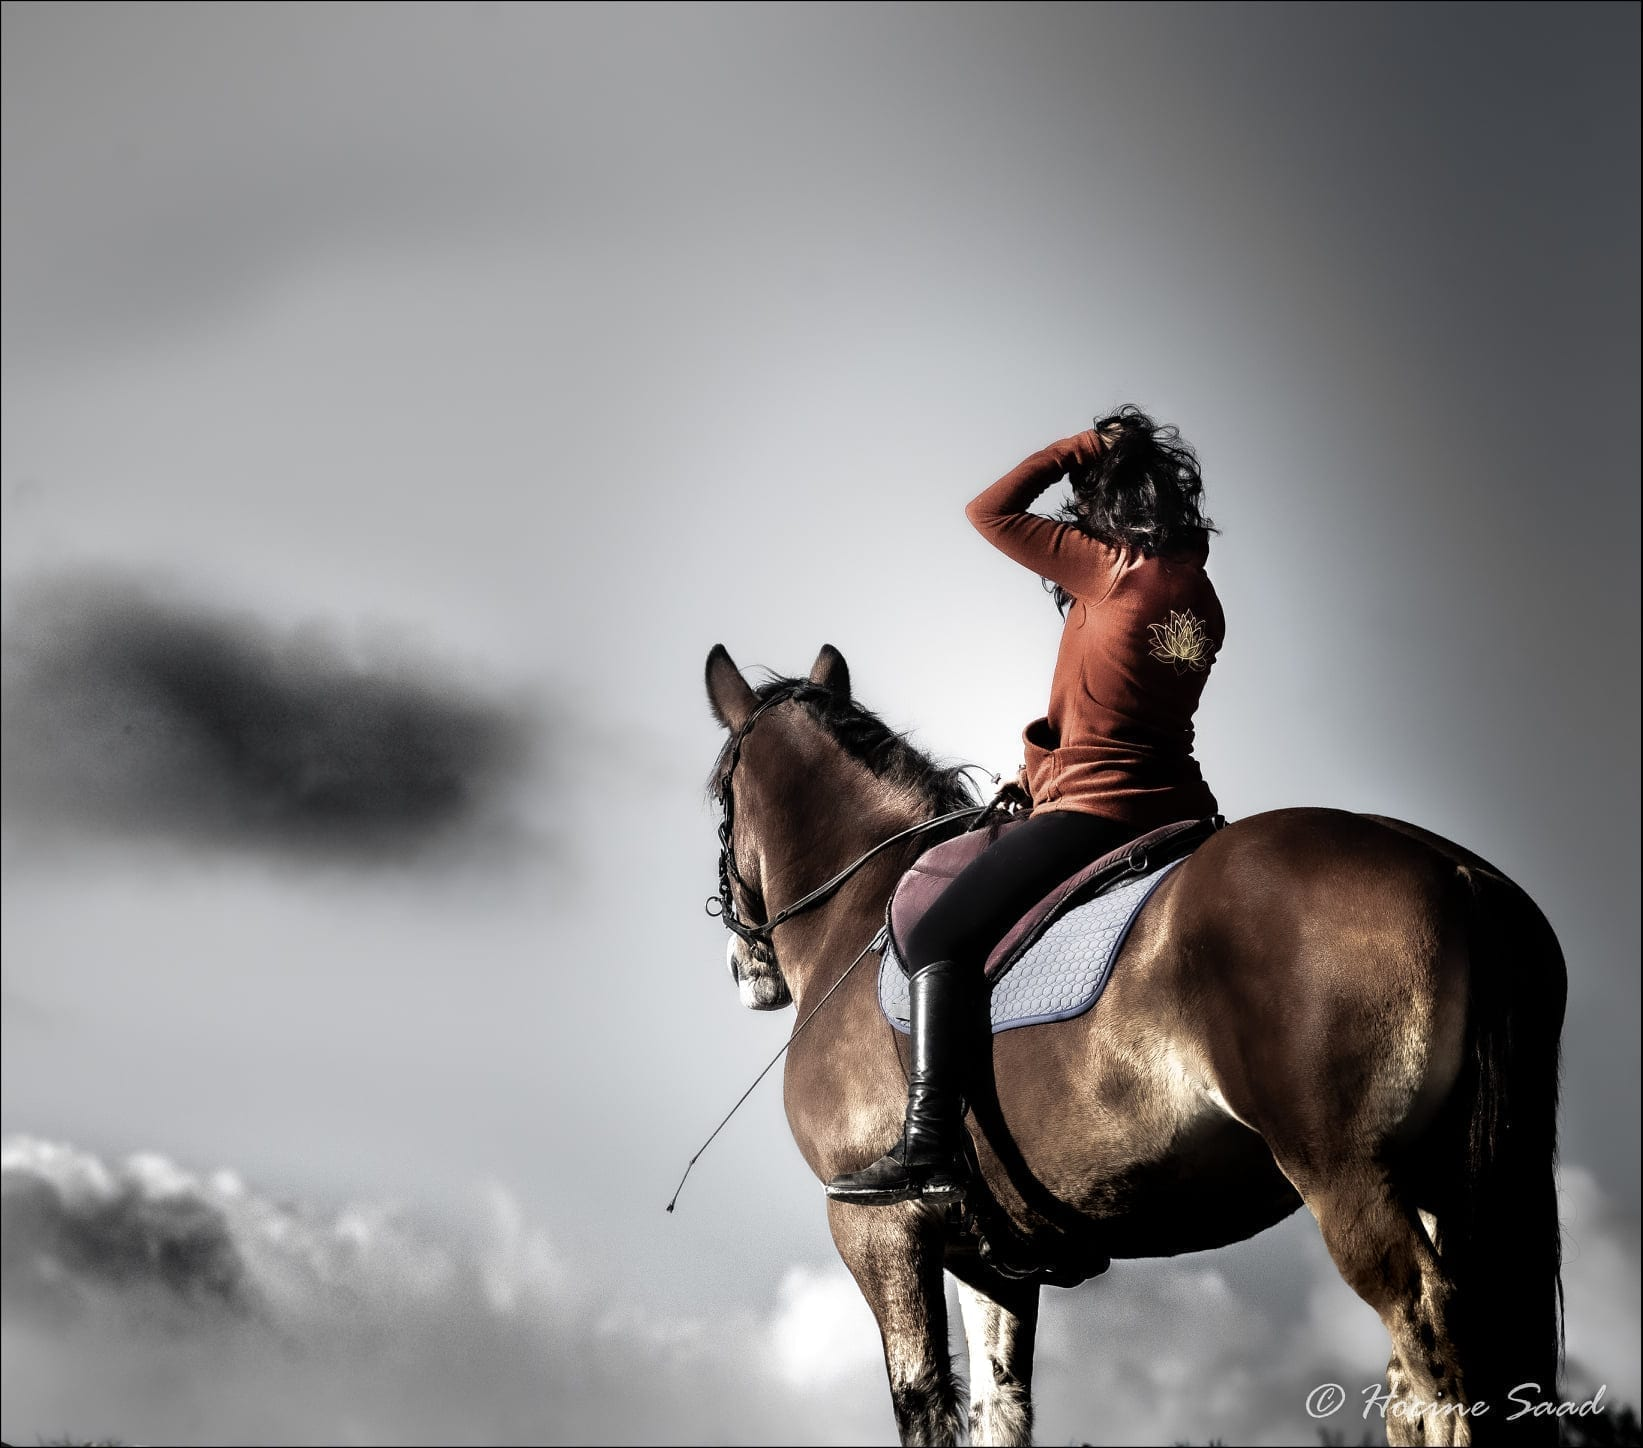 penjab cavaliere equitation conscience ensemble